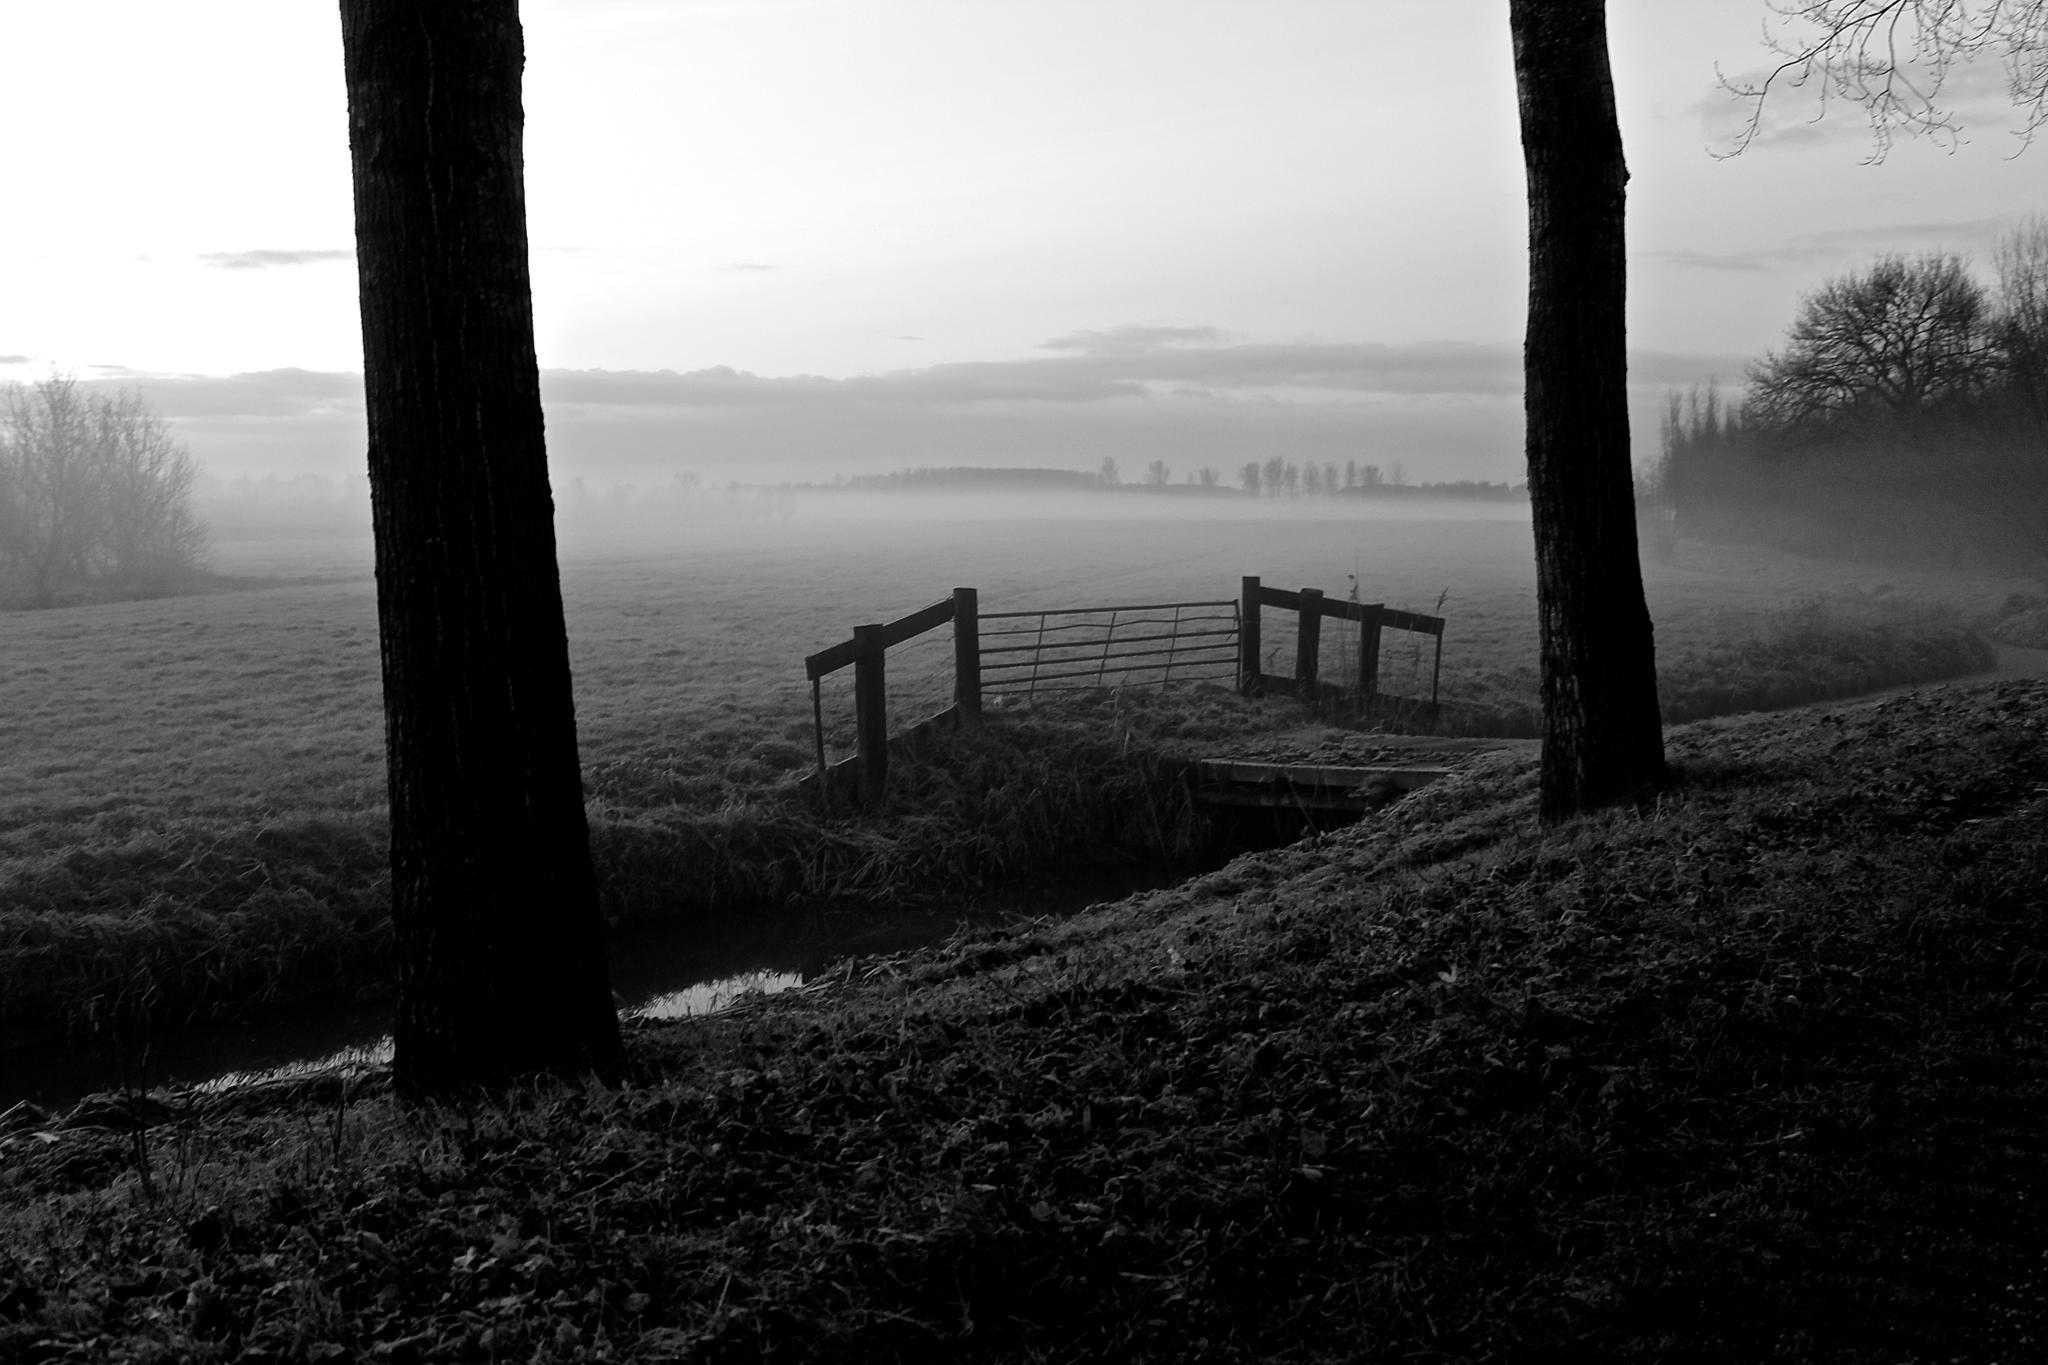 Fence, tree, fog and sky ... by John Weijts